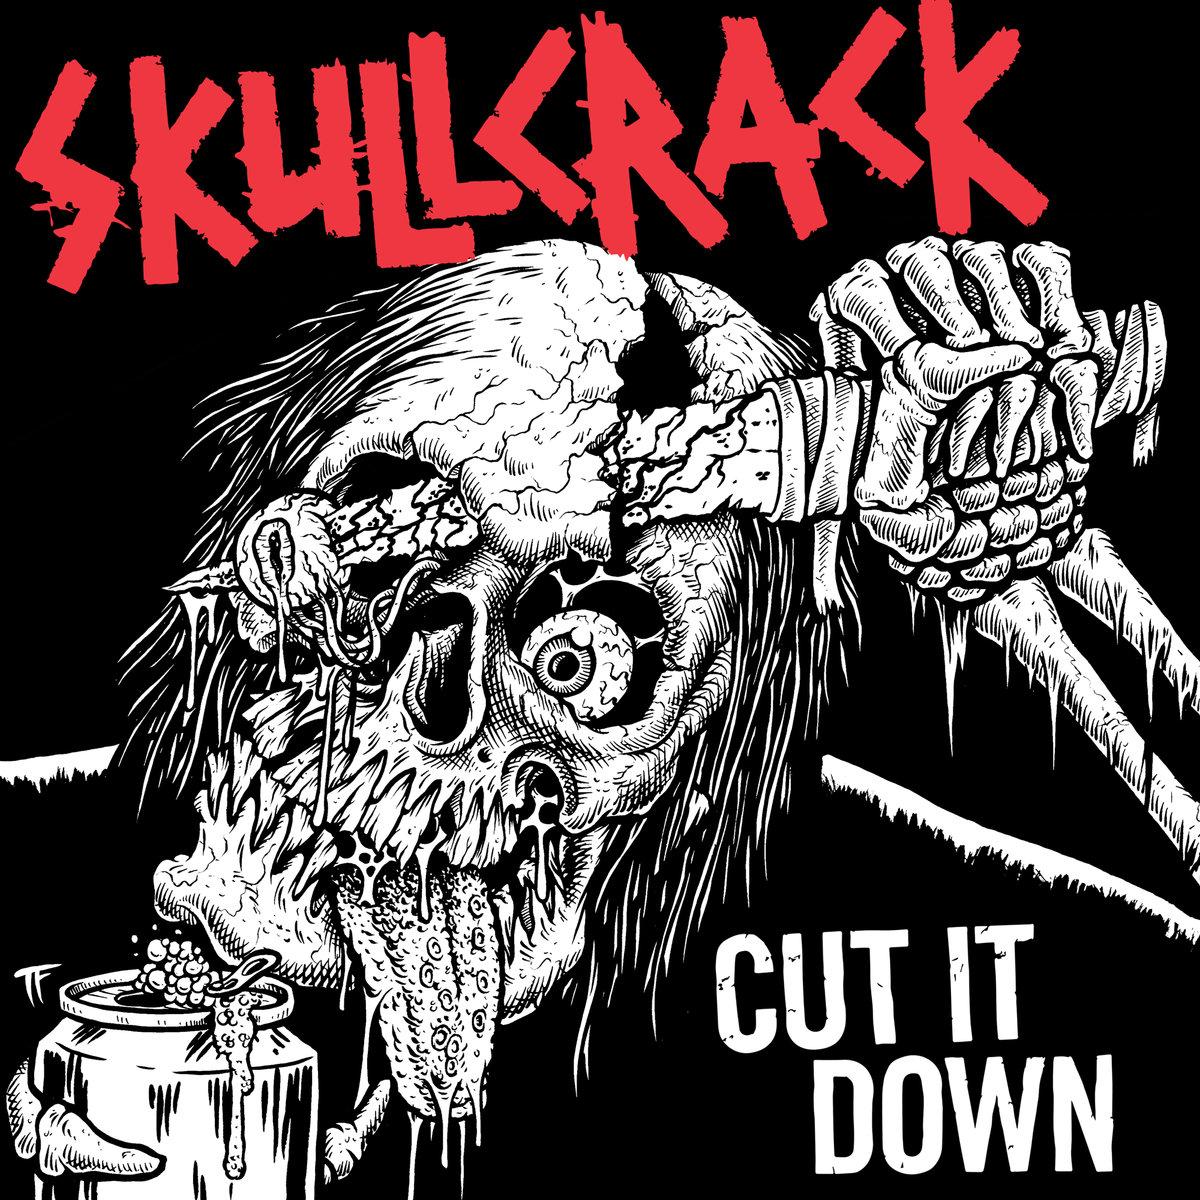 Skullcrack – Cut it down